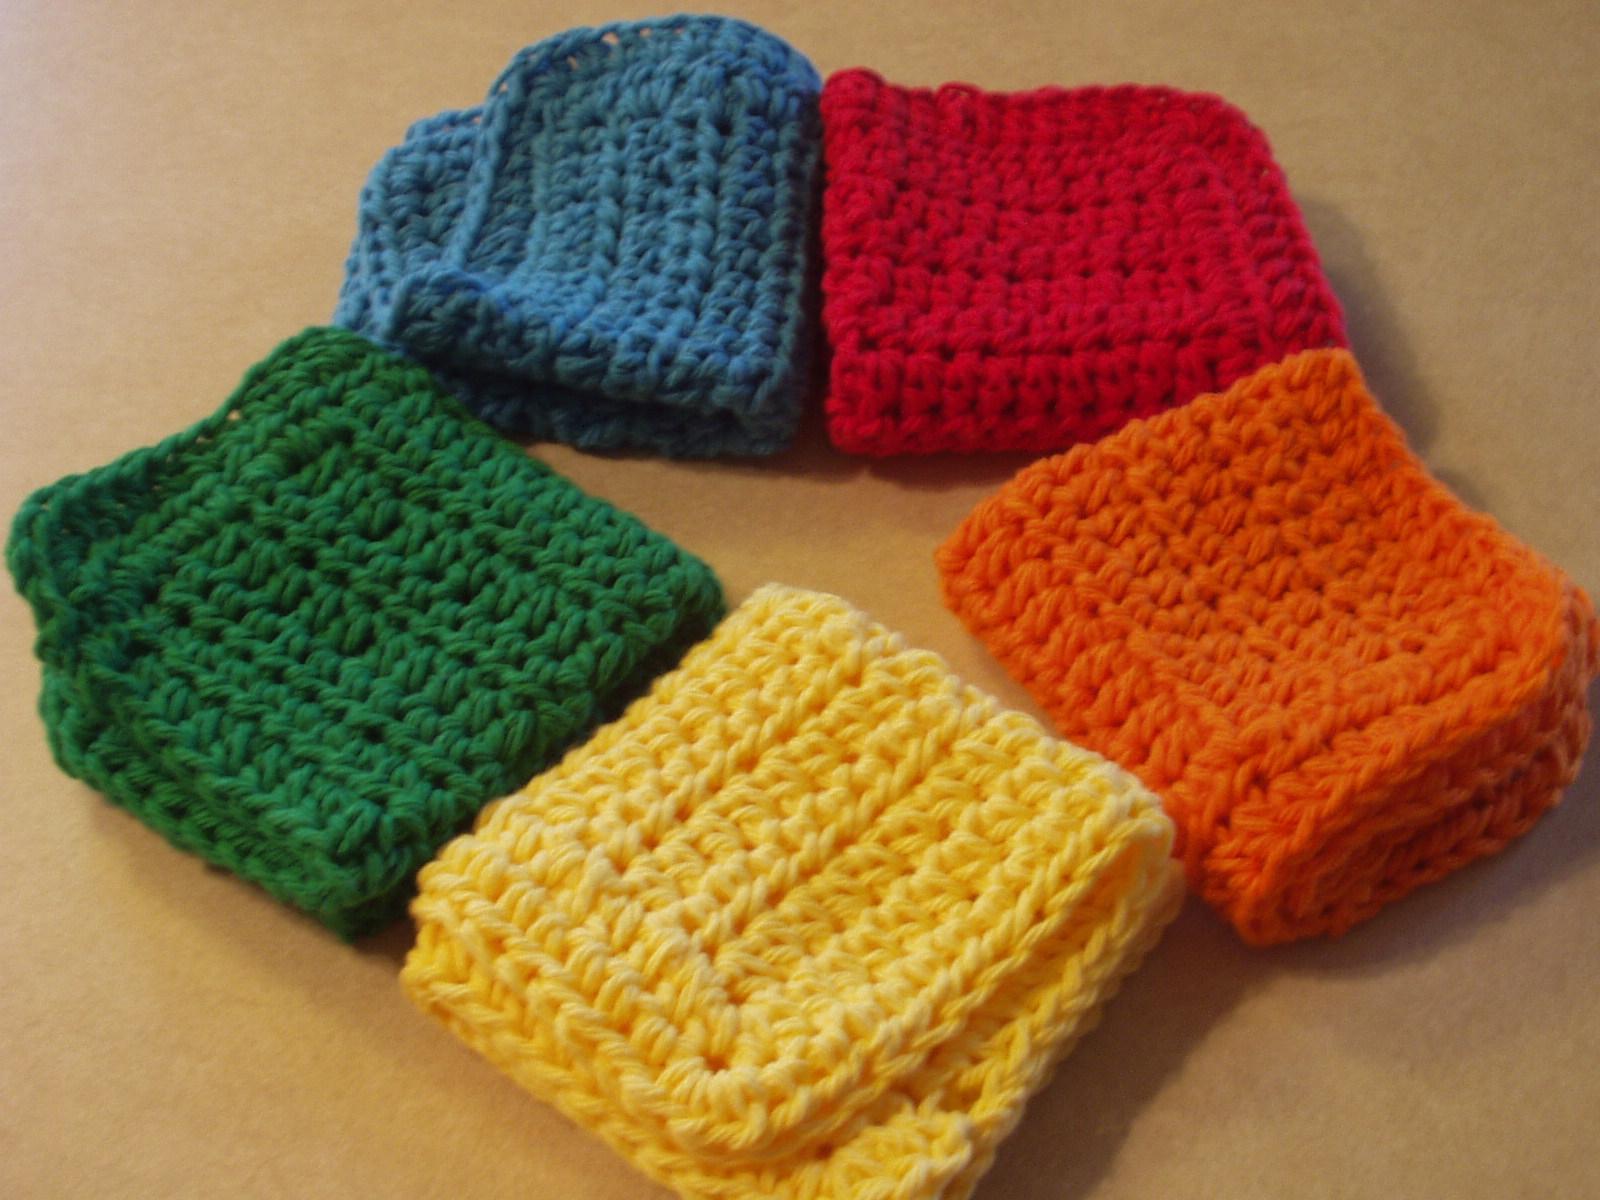 Crochet Patterns Free For Beginners Dishcloths : crochet:: my favorite dishcloth yarnchick40